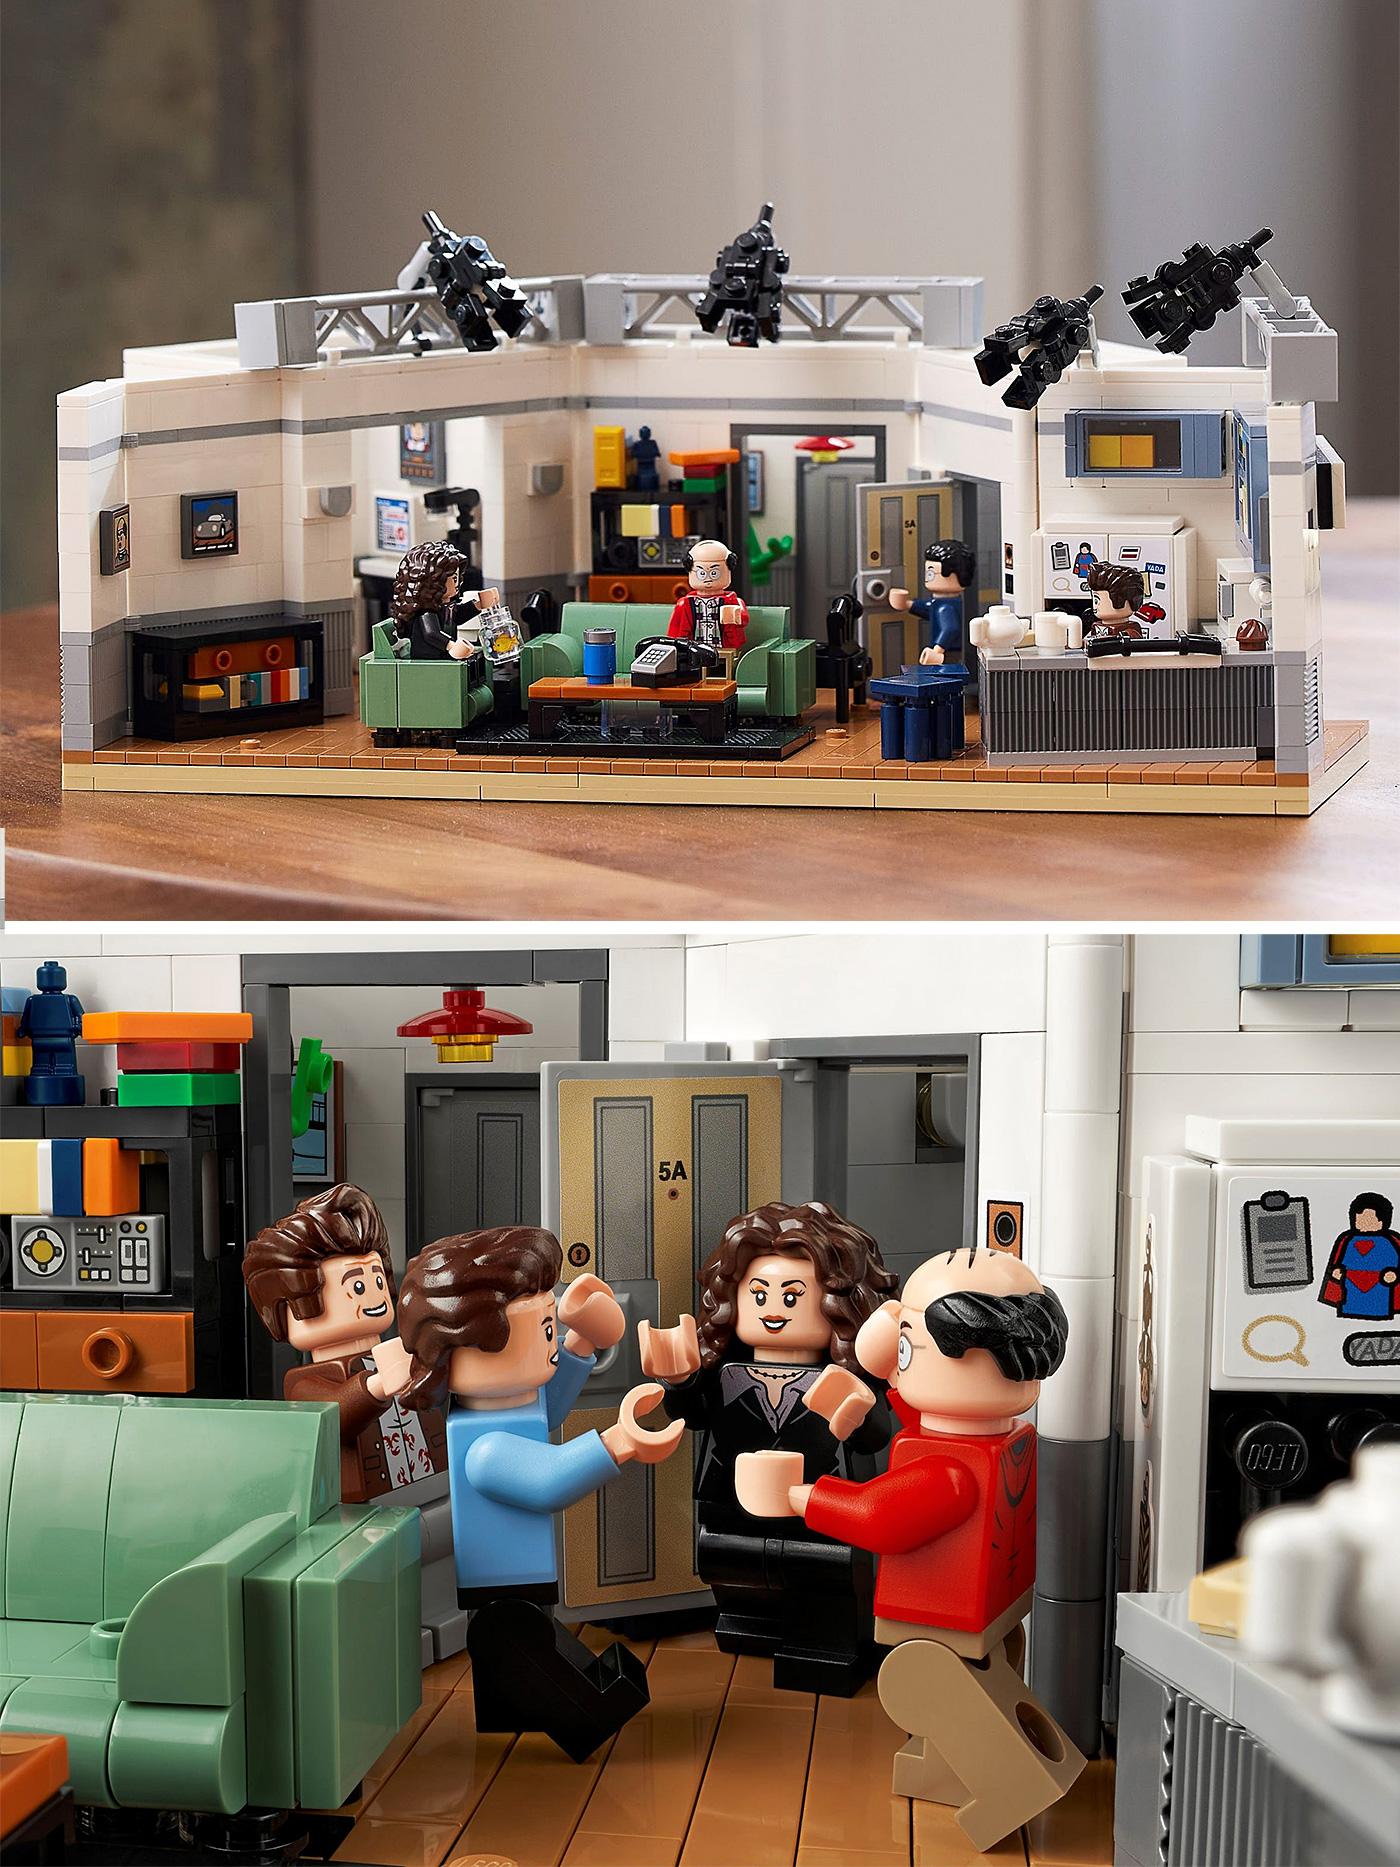 LEGO Seinfeld Set Recreates the Classic Sitcom at werd.com